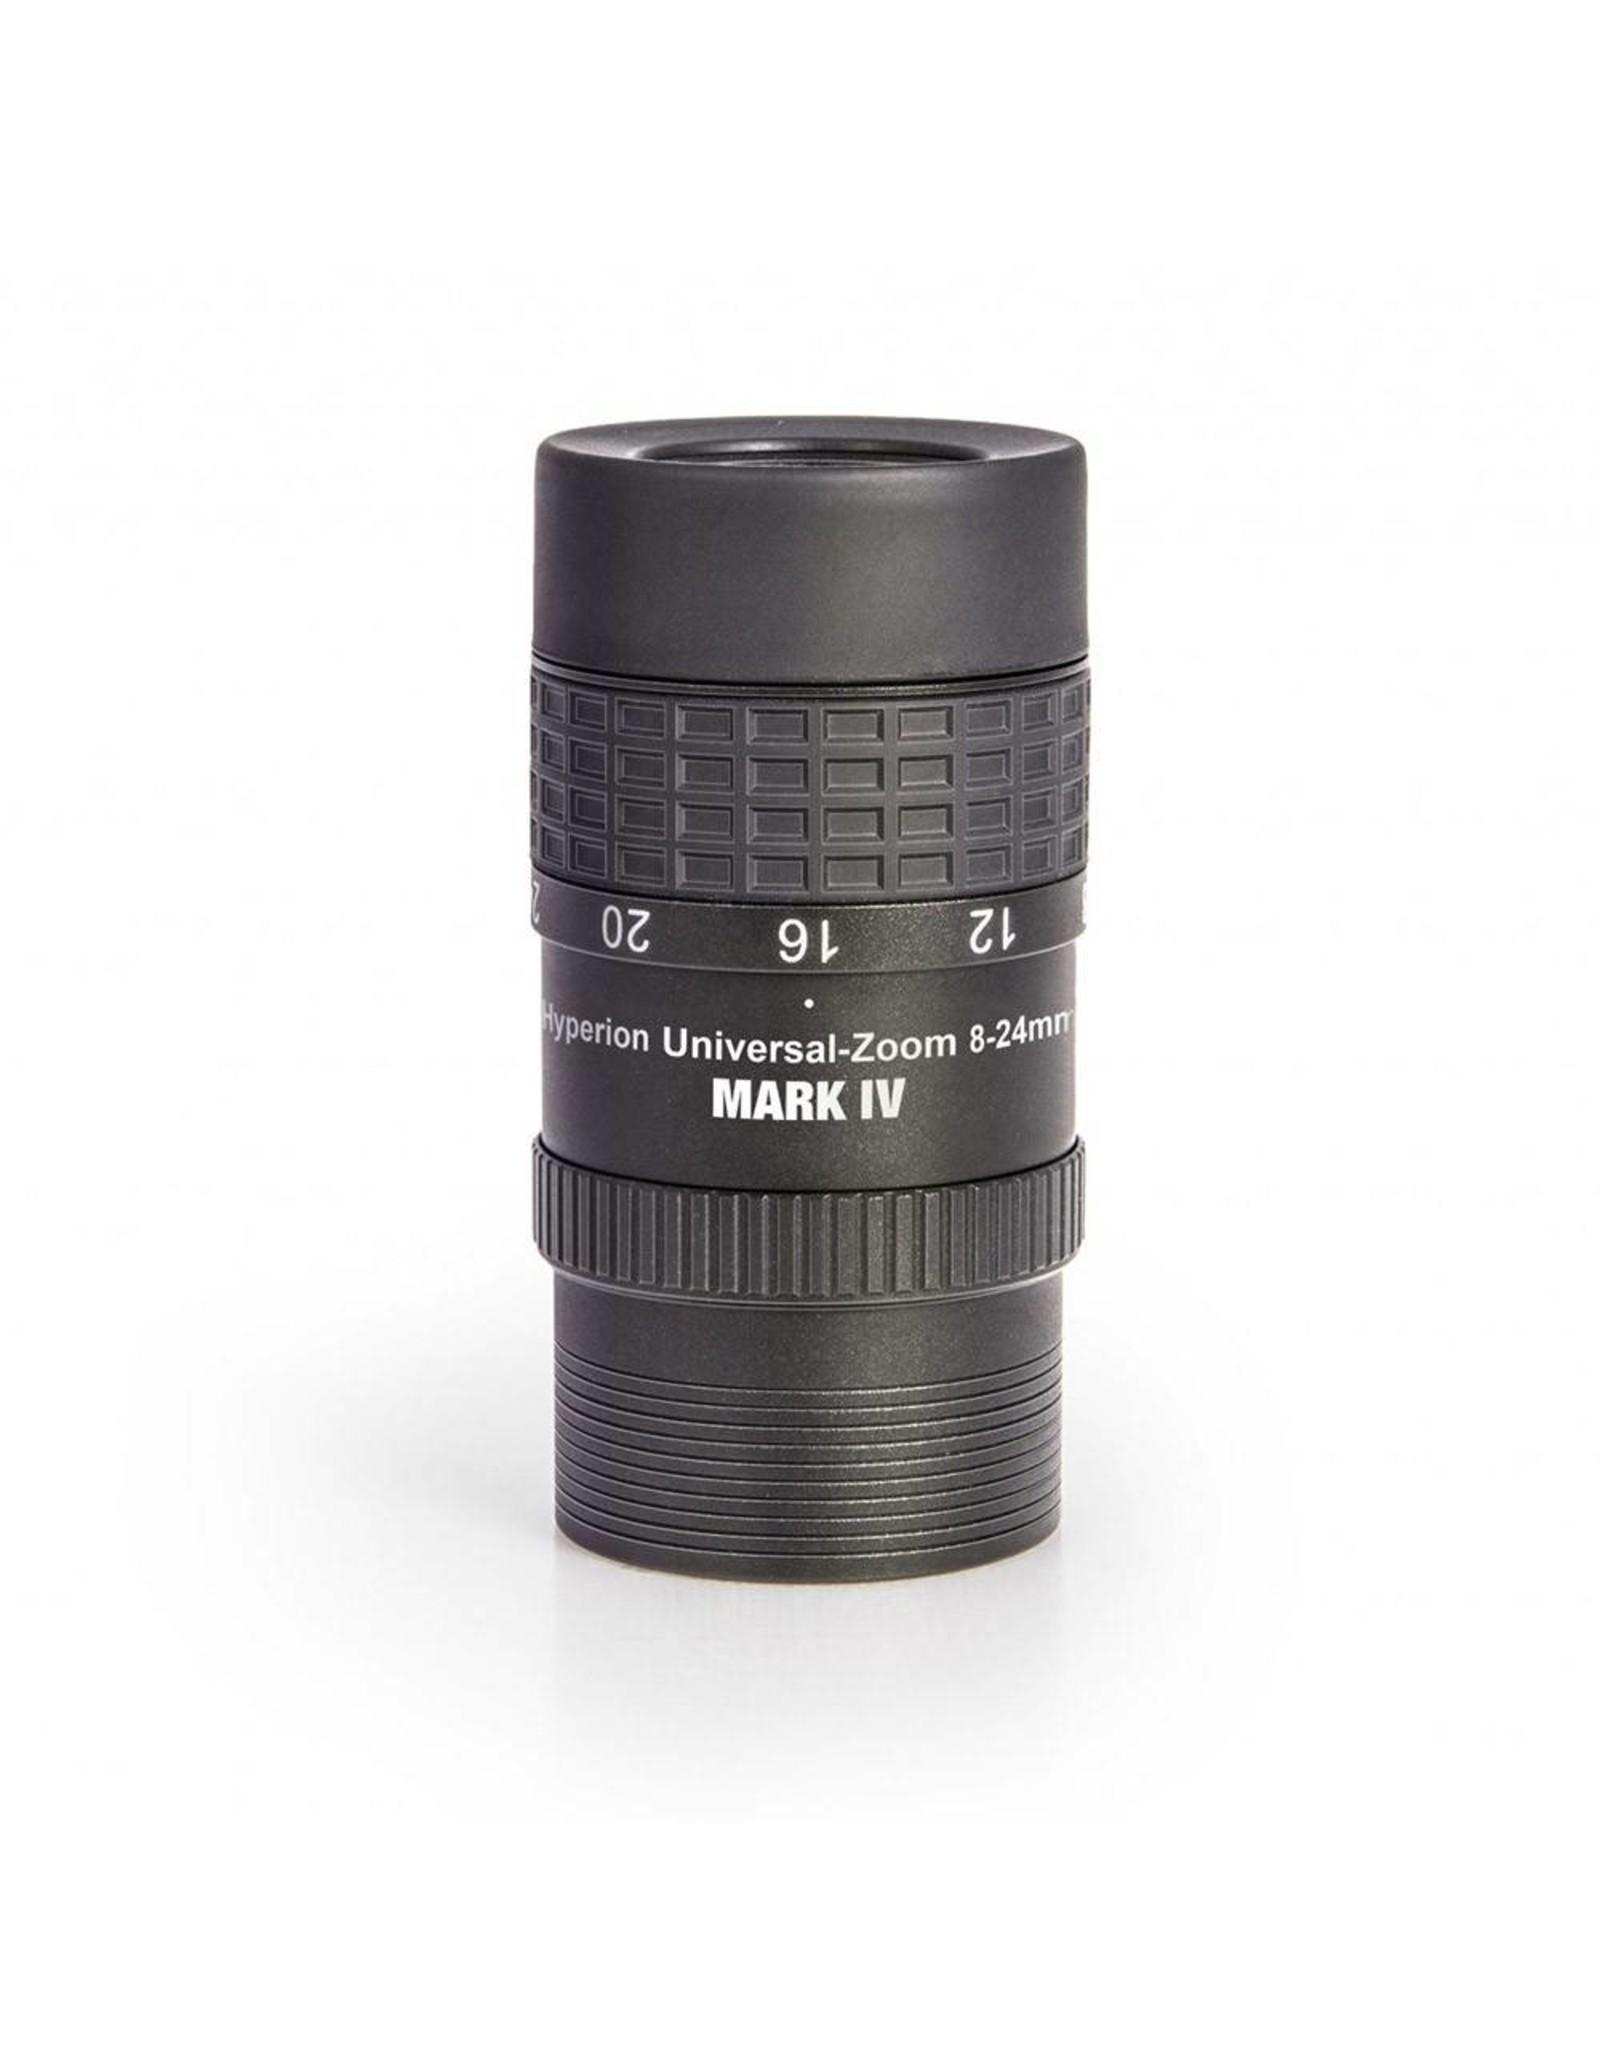 "Baader Planetarium Baader Hyperion Universal Zoom Mark IV, 8-24mm eyepiece (1¼"" / 2"")"